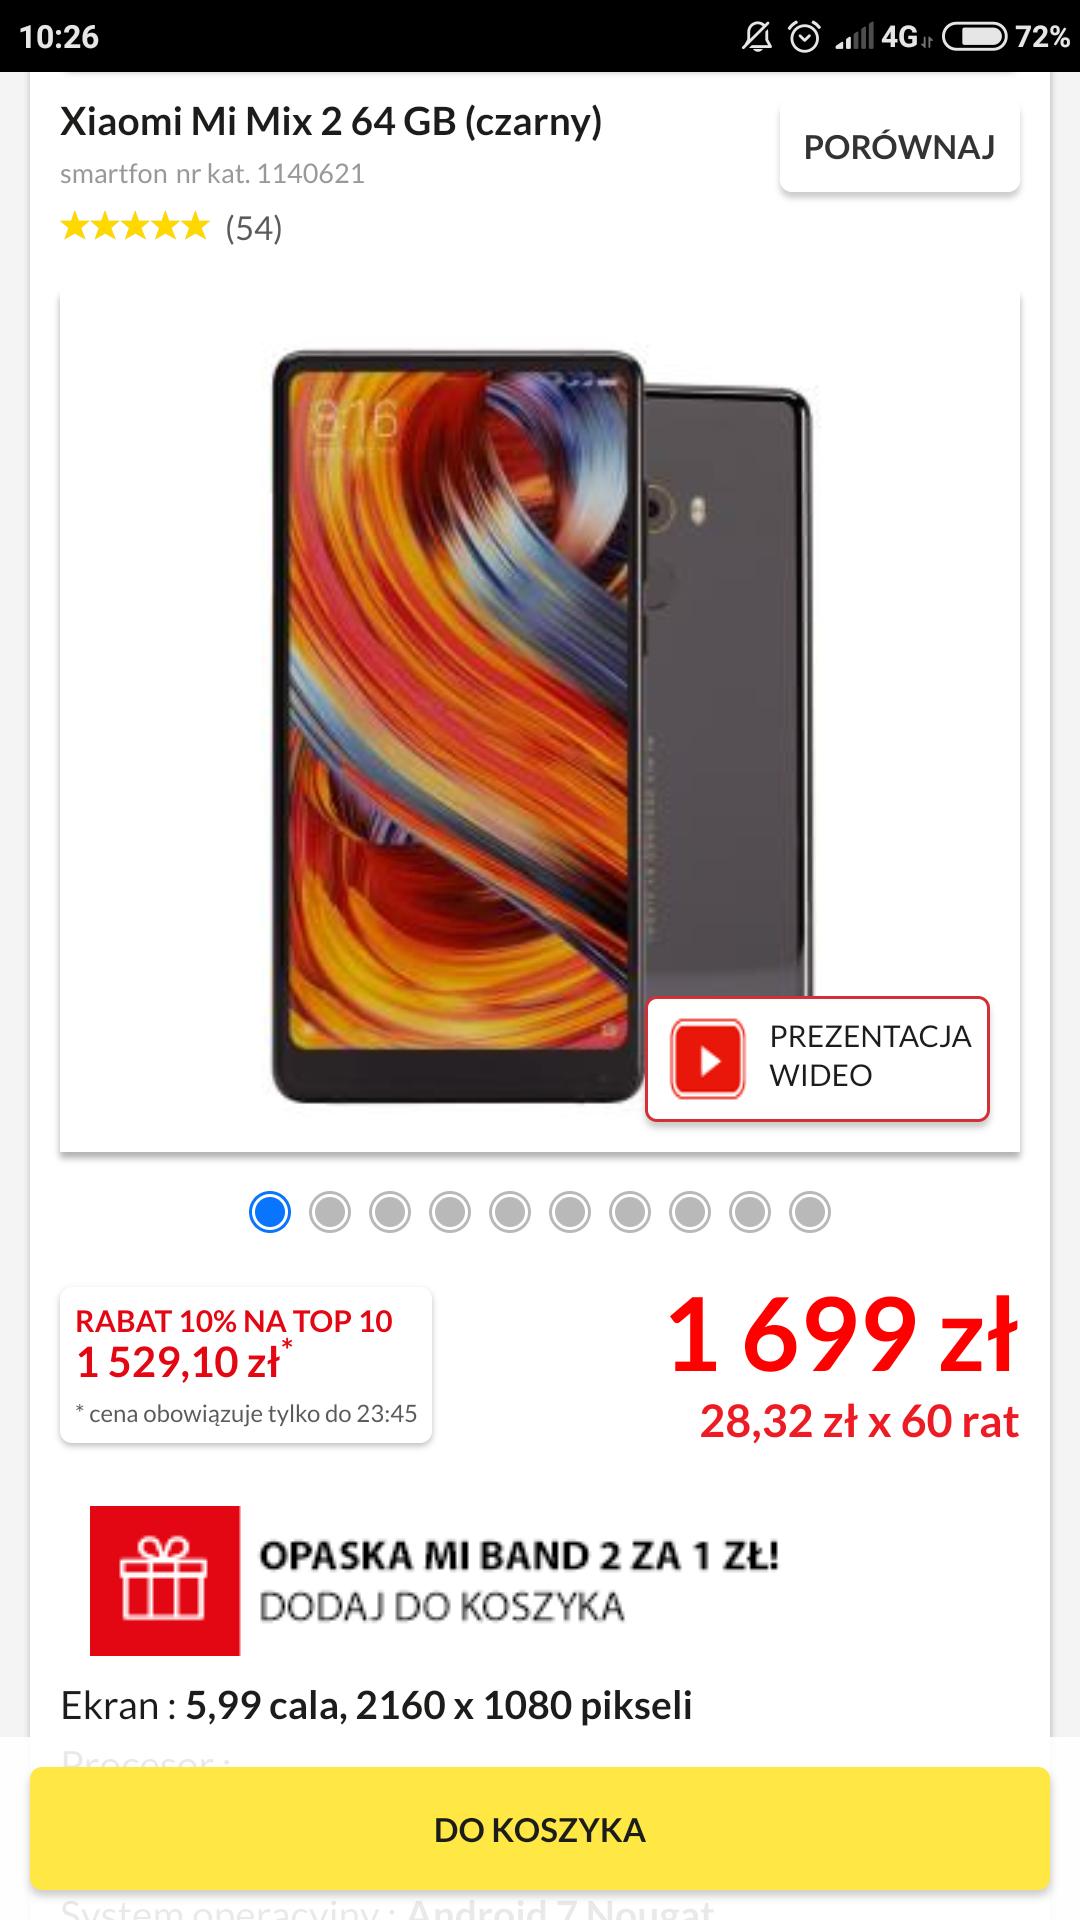 RTV euro AGD Xiaomi mi mix 2 + opaska mi band 2